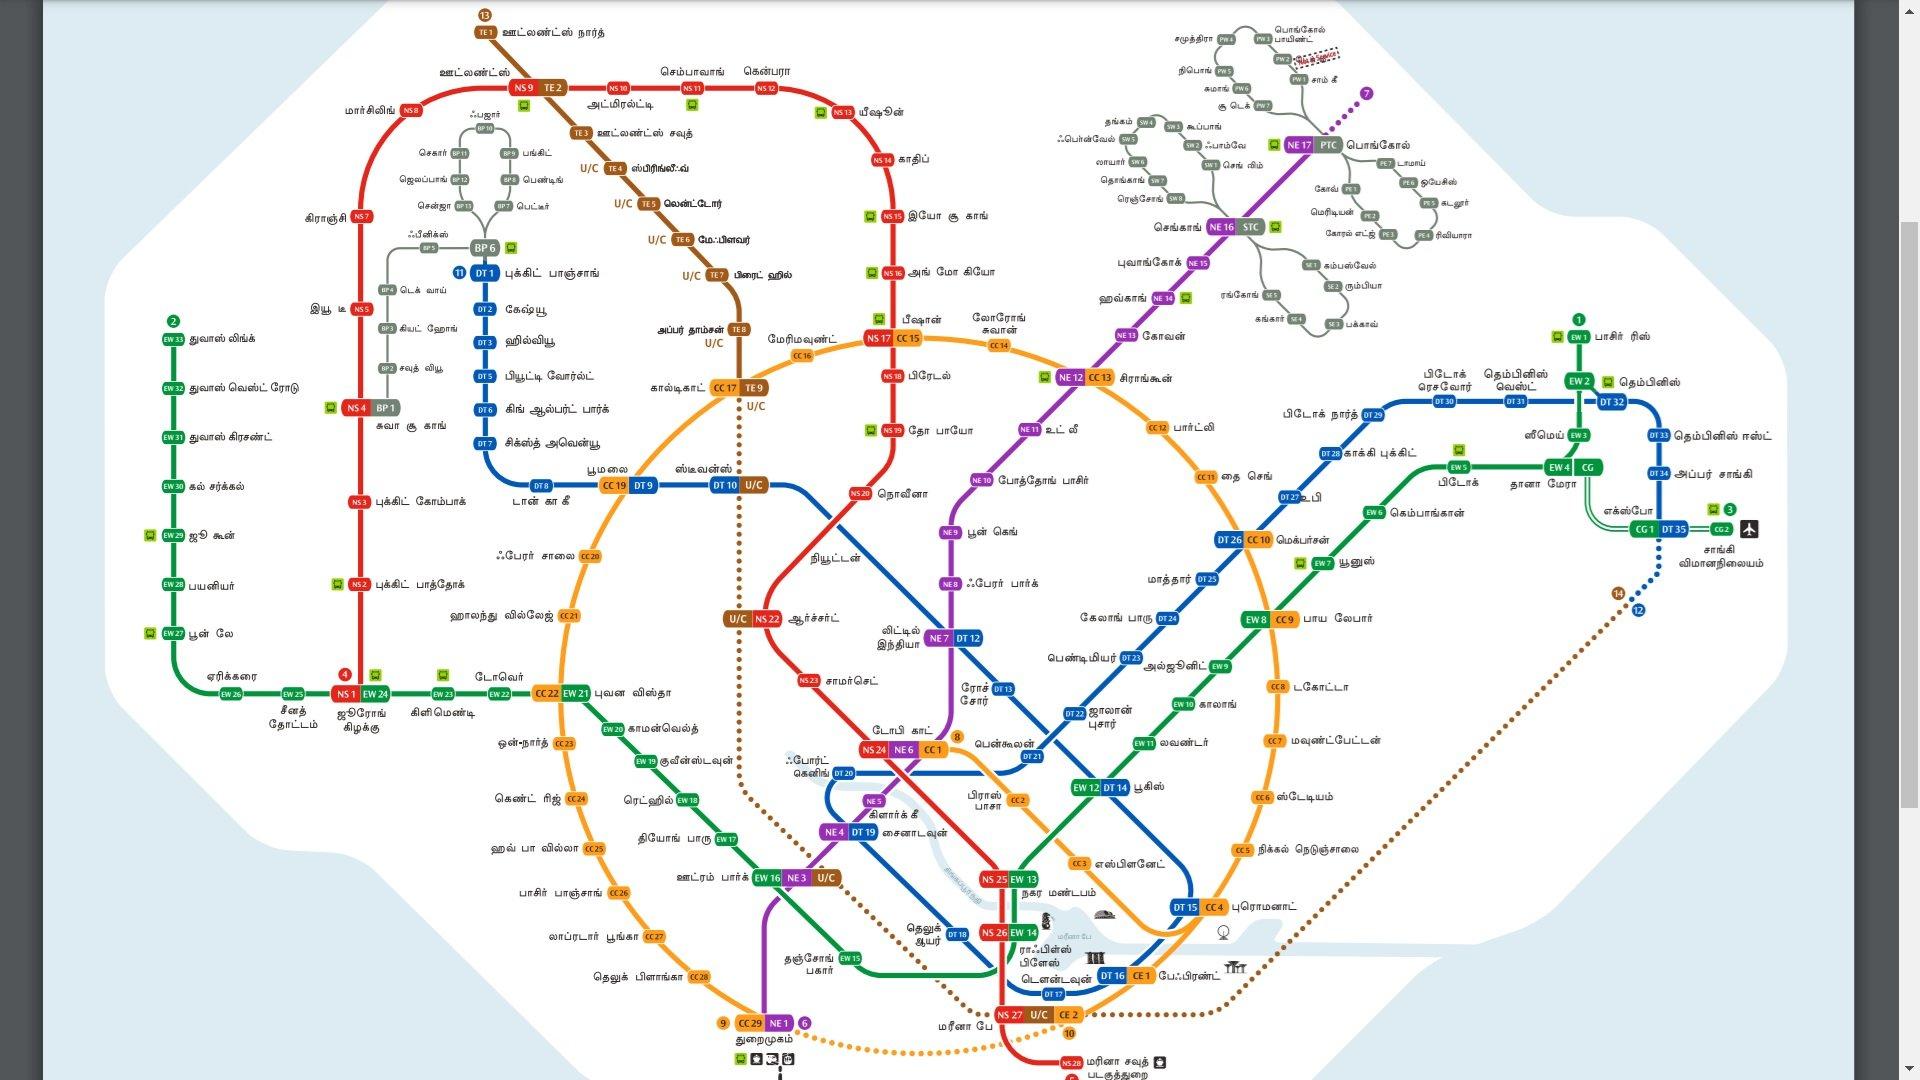 singapore mrt map 2020 Indian language